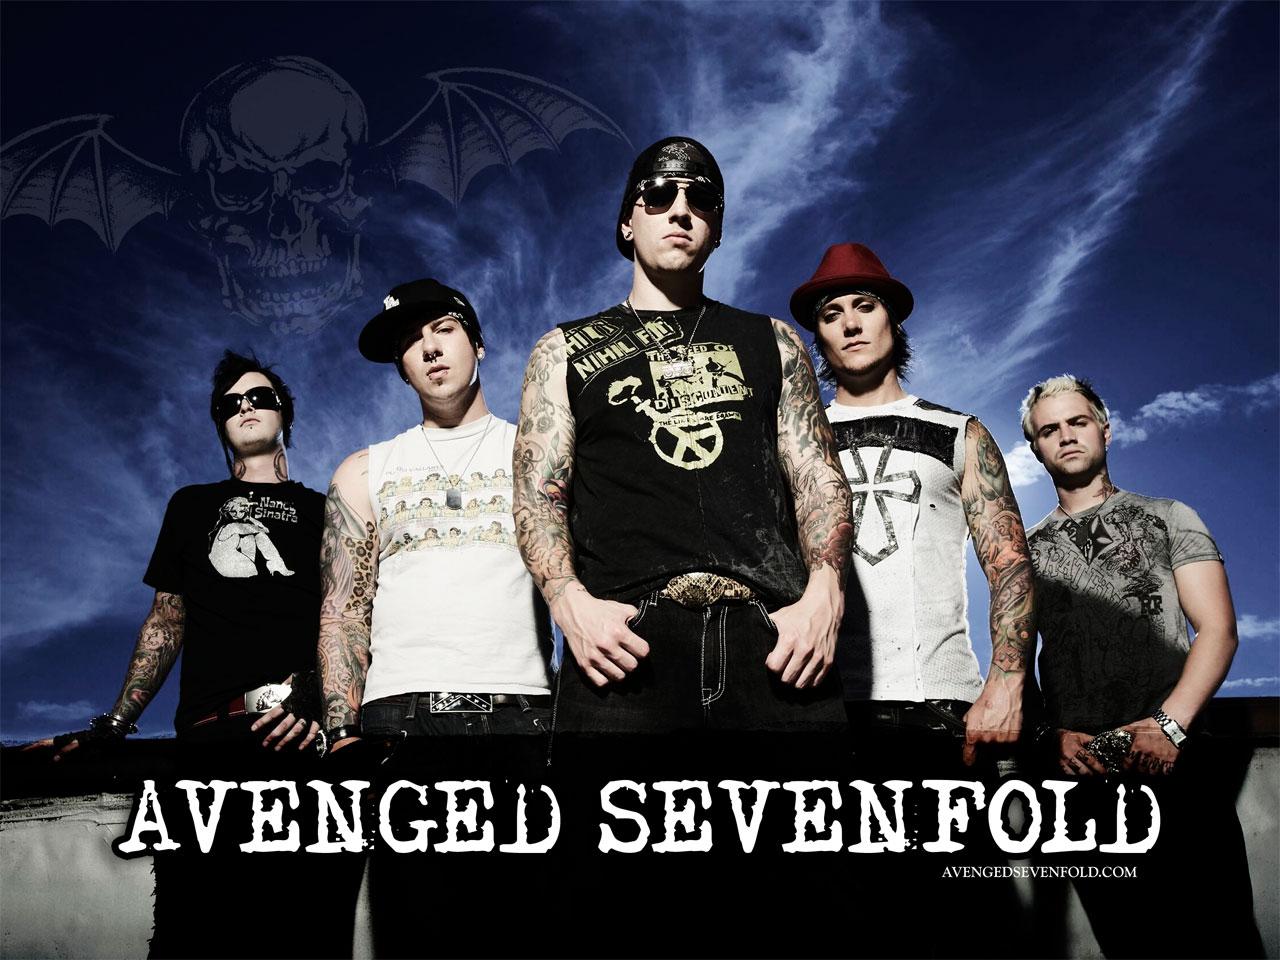 http://2.bp.blogspot.com/-BYsAh4igWbY/TYaKjUcsJgI/AAAAAAAAAMw/r8Rs66Wzl5w/s1600/avenged_sevenfold.jpg